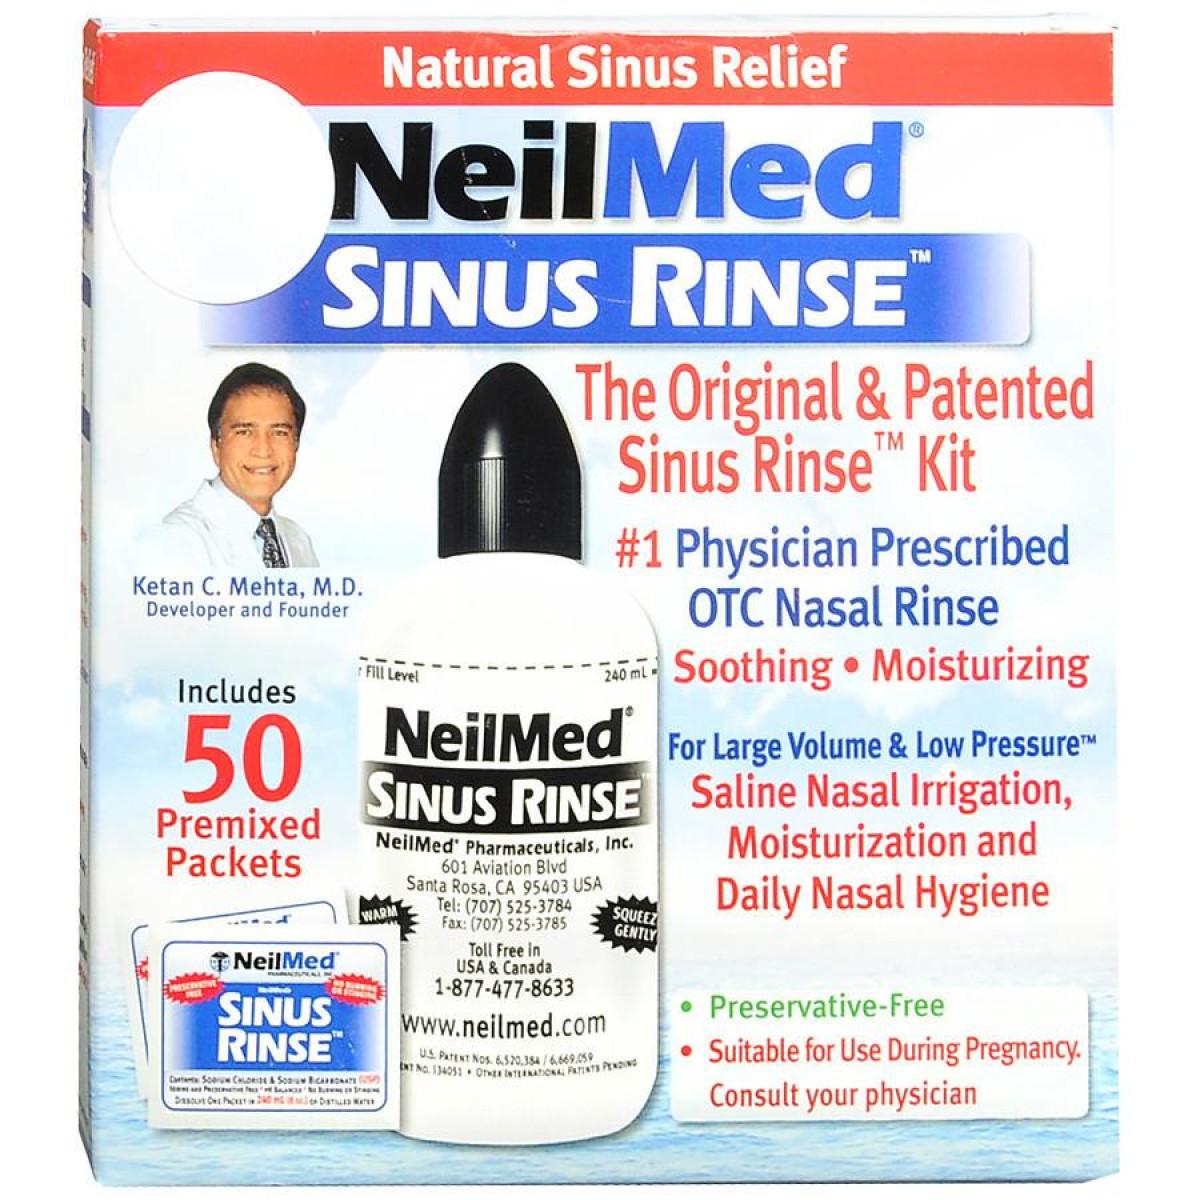 NeilMed Sinus Rinse Original Sinus Kit